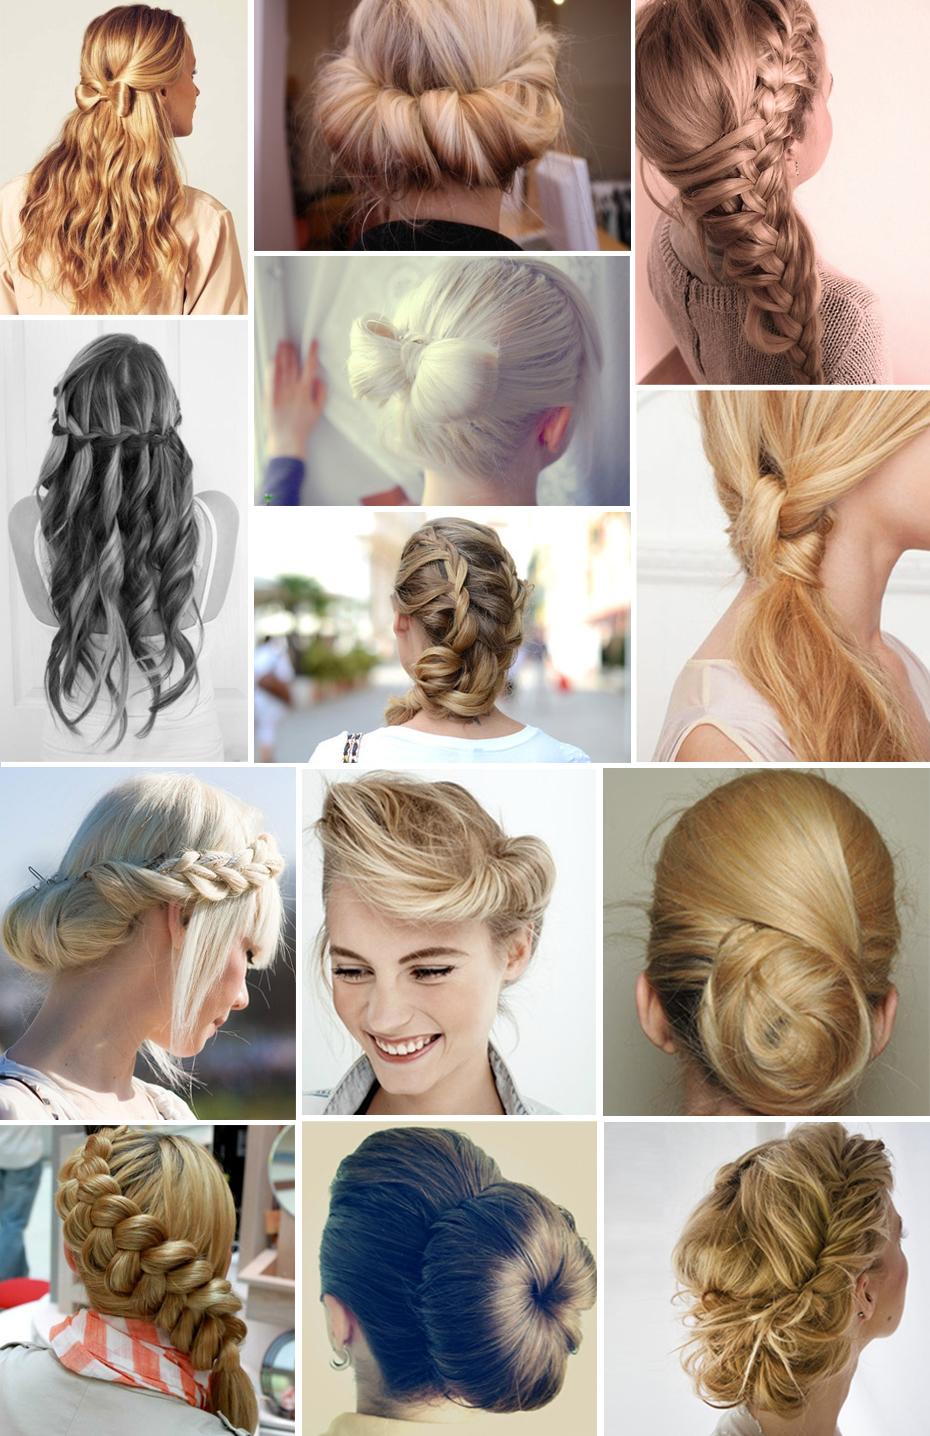 Örgü mezuniyet saçı saç modelleri 2012 hairstyles braid hair